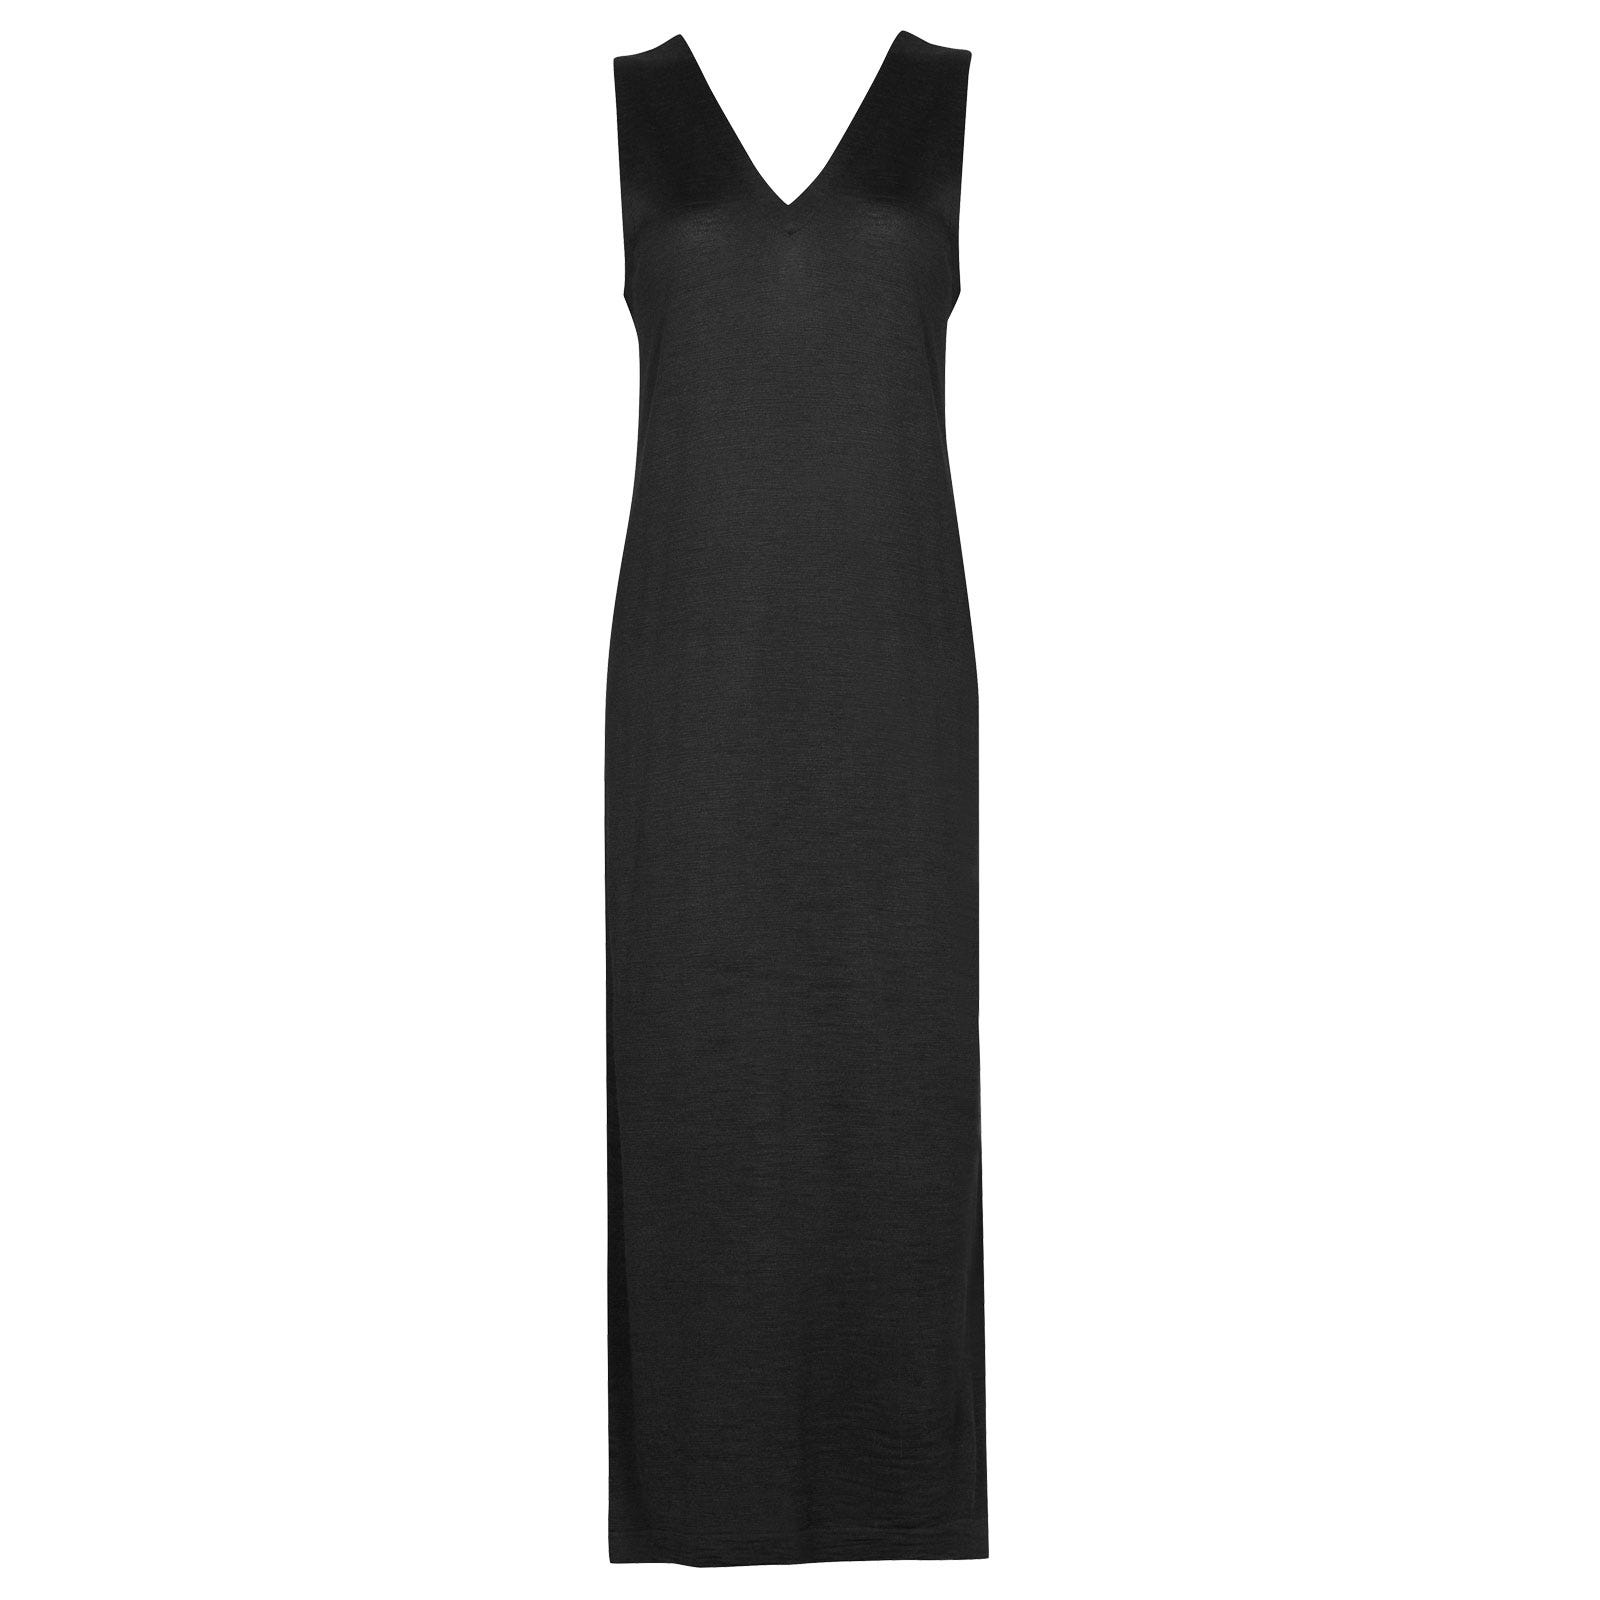 John Smedley Mila in Black Dress-xsm